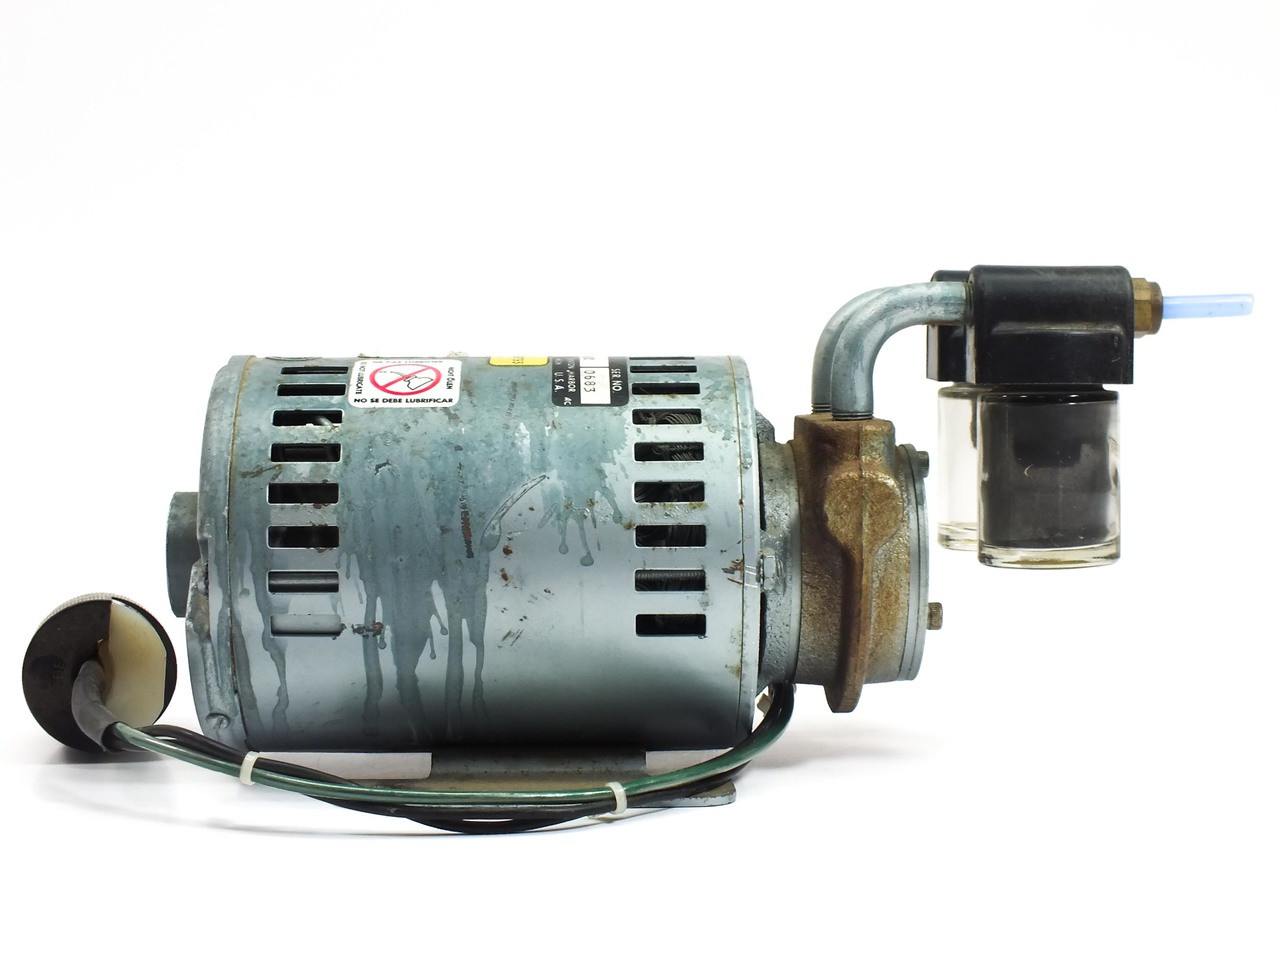 Gast Vacuum Pumps Wiring Diagram Schematic Diagrams 1531 107b G288x 1 10 Hp Rotary Vane Pump Recycledgoods Com Trouble Shooting